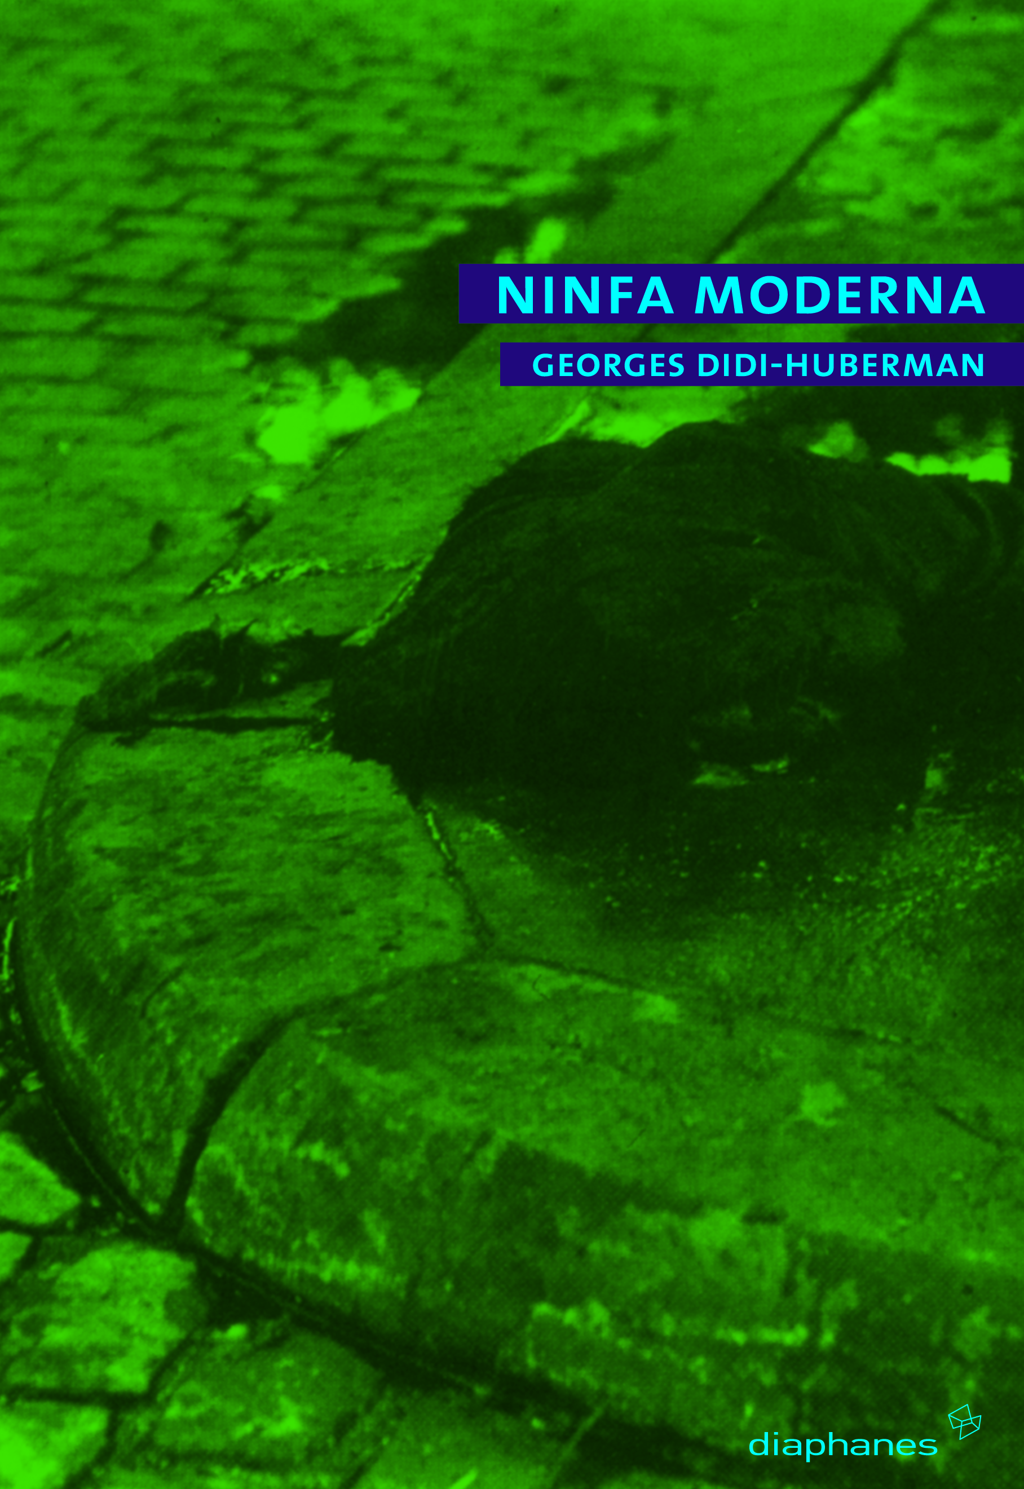 Ninfa moderna - Didi-Huberman, Georges